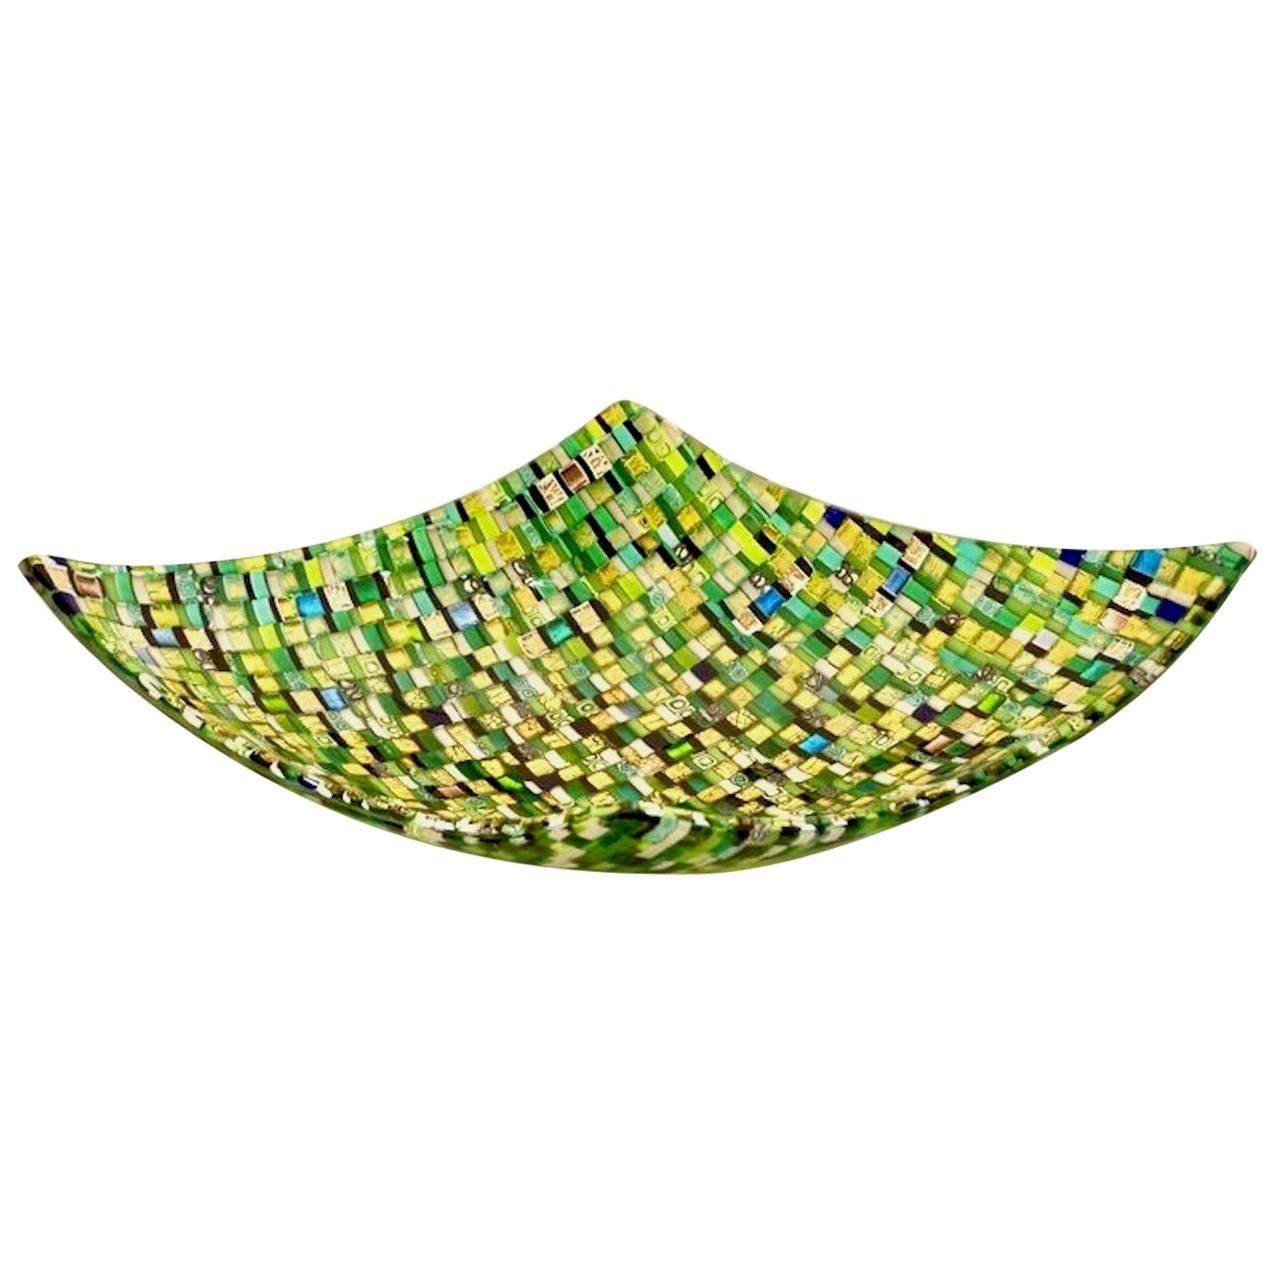 Modern Italian Jewel-Like Green Yellow & 24Kt Gold Murano Art Glass Mosaic Bowl